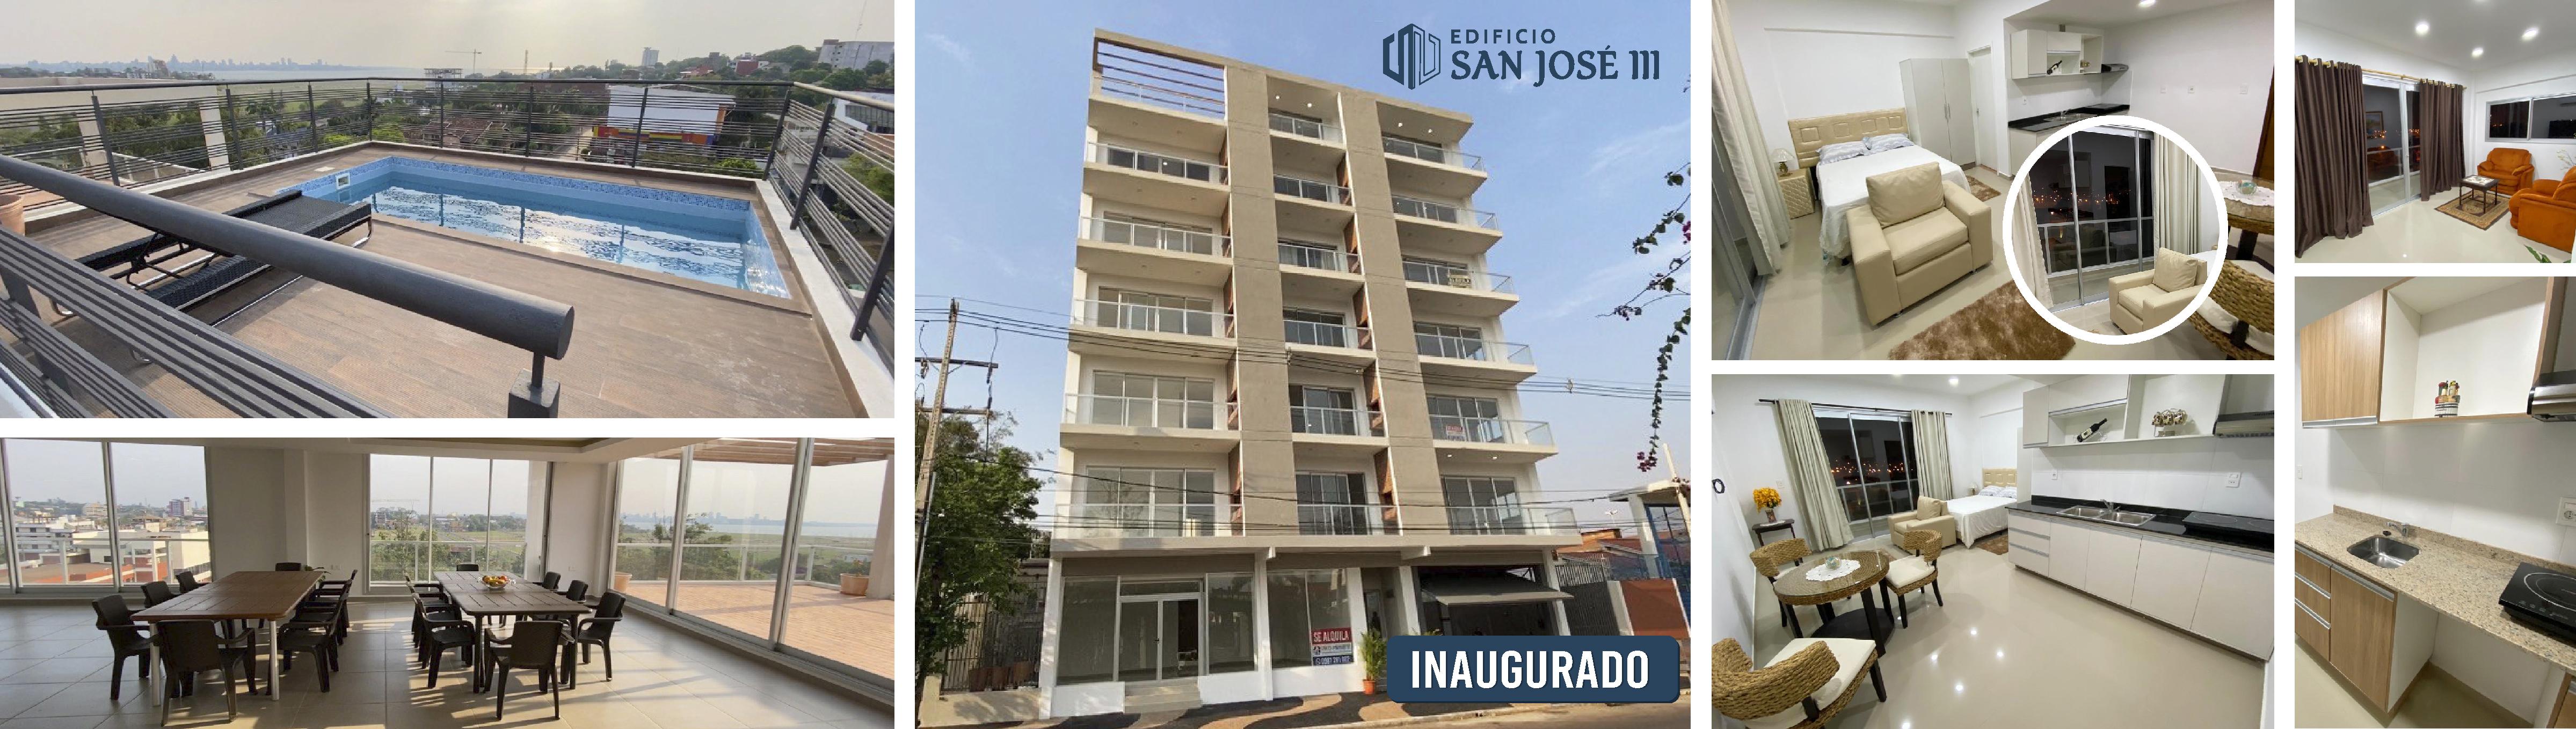 San José III - Concluido